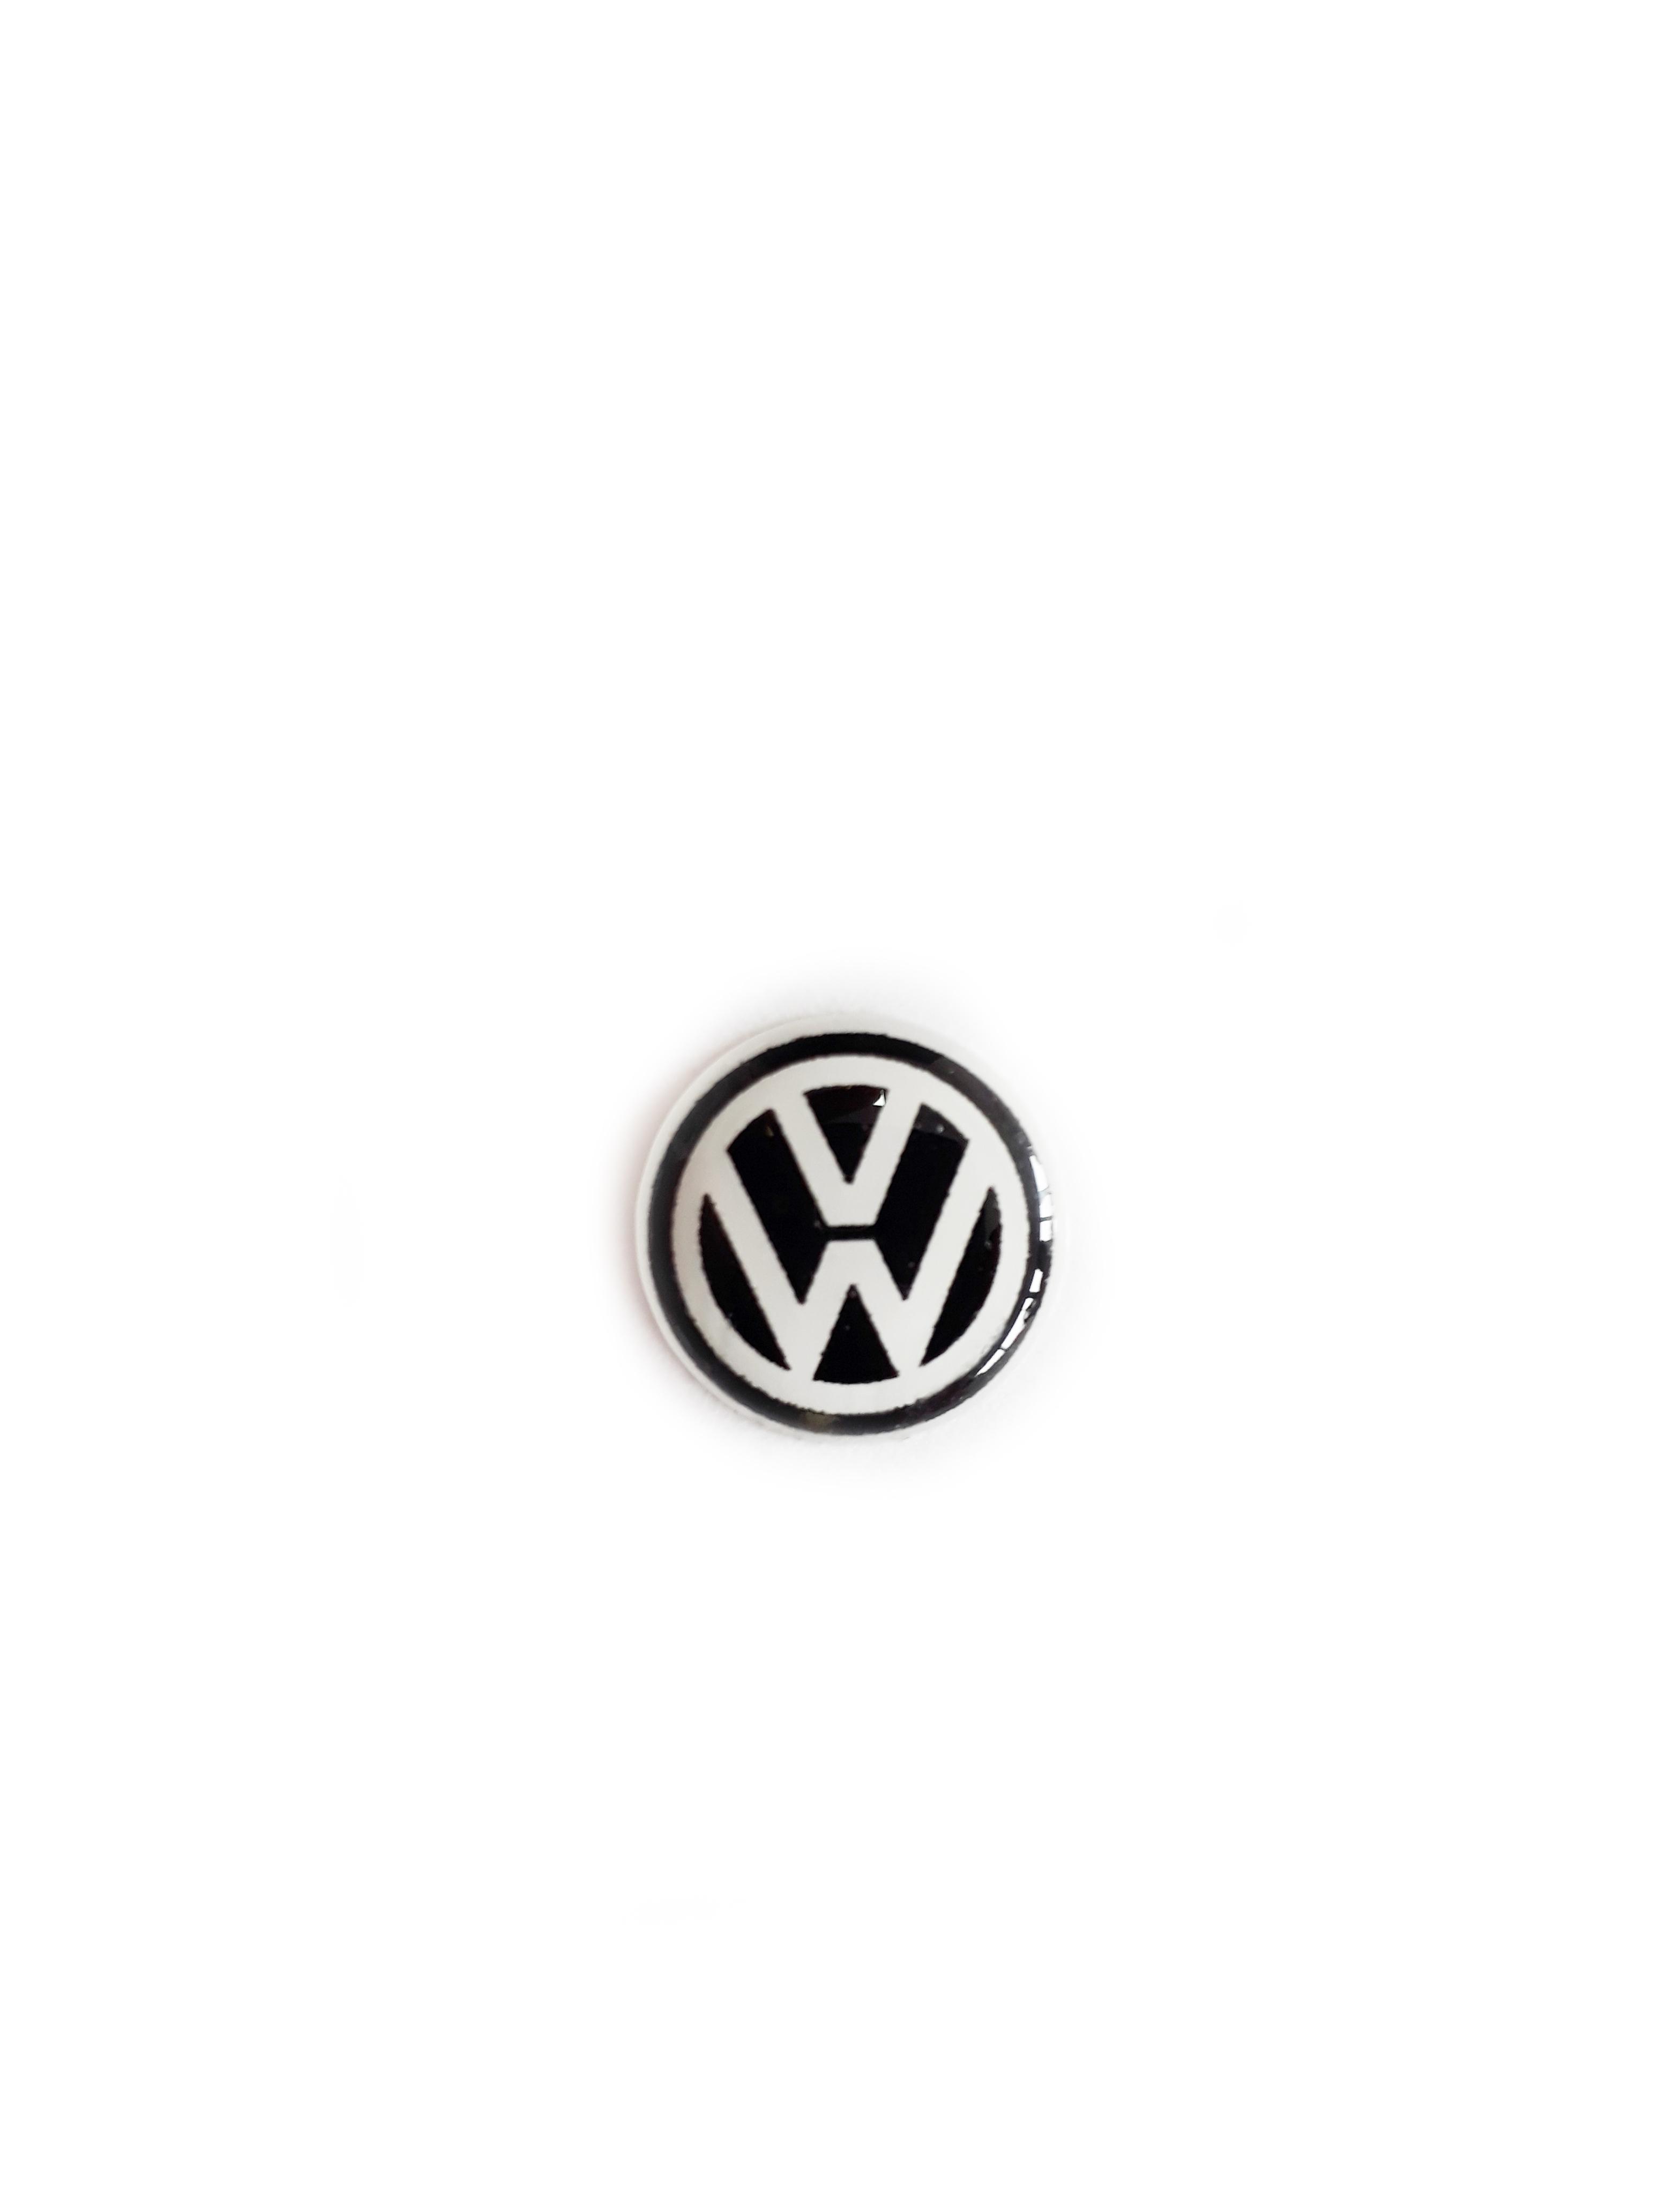 Anahtar Logosu 12mm - Volkswagen Siyah